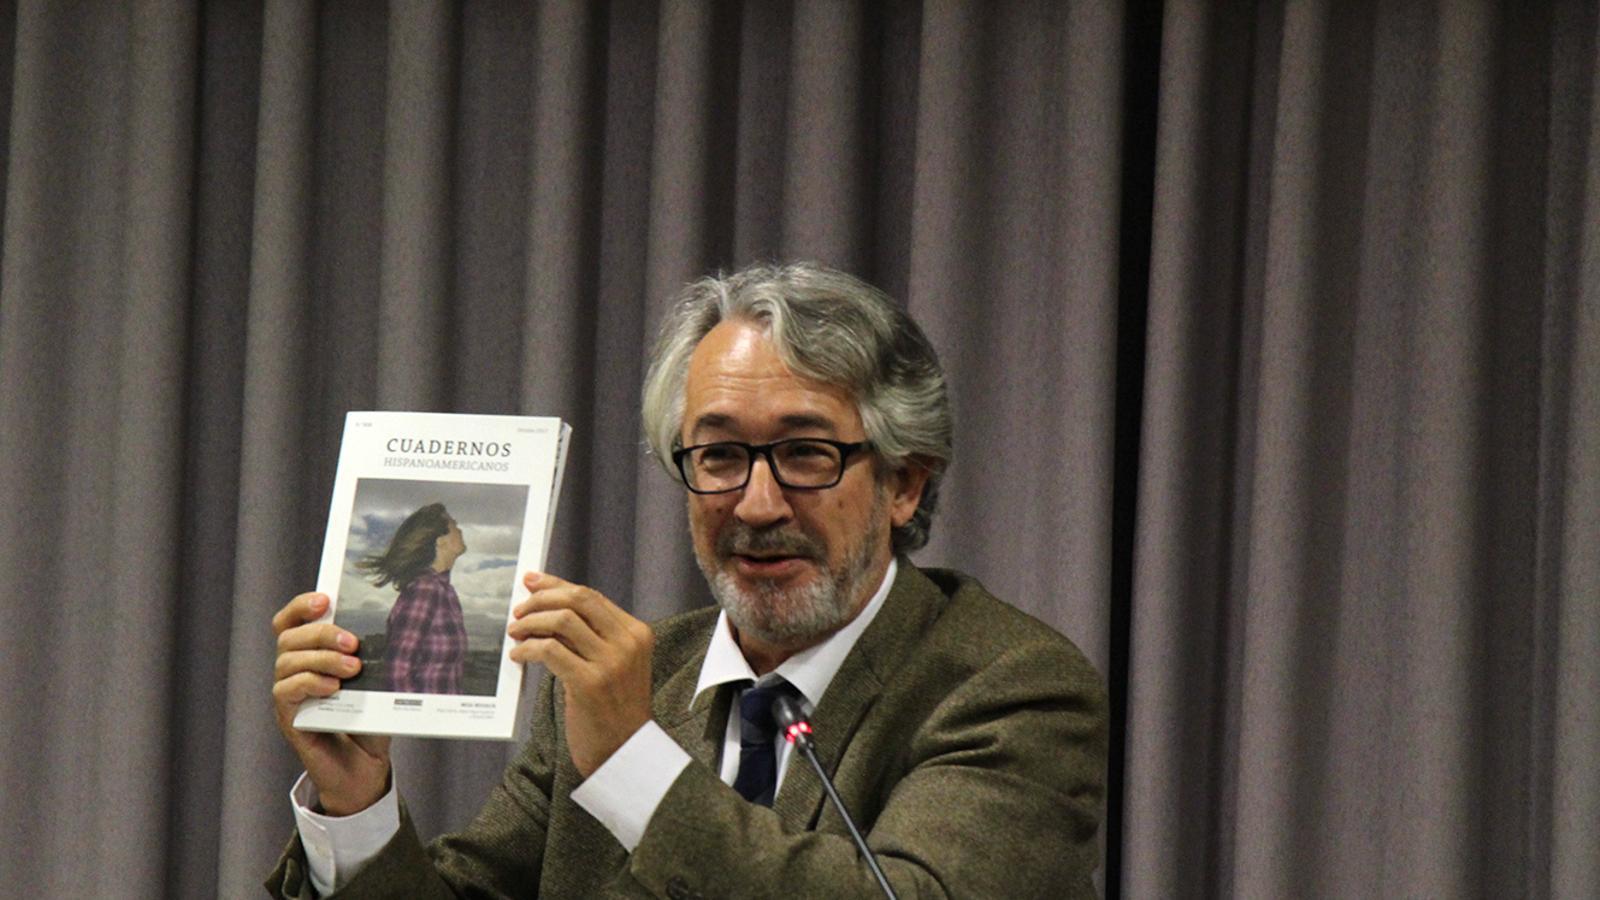 El director de la revista Cuadernos Hispanoamericanos, Juan Malpartida, sosté un dels exemplars de la revista. / M. M. (ANA)